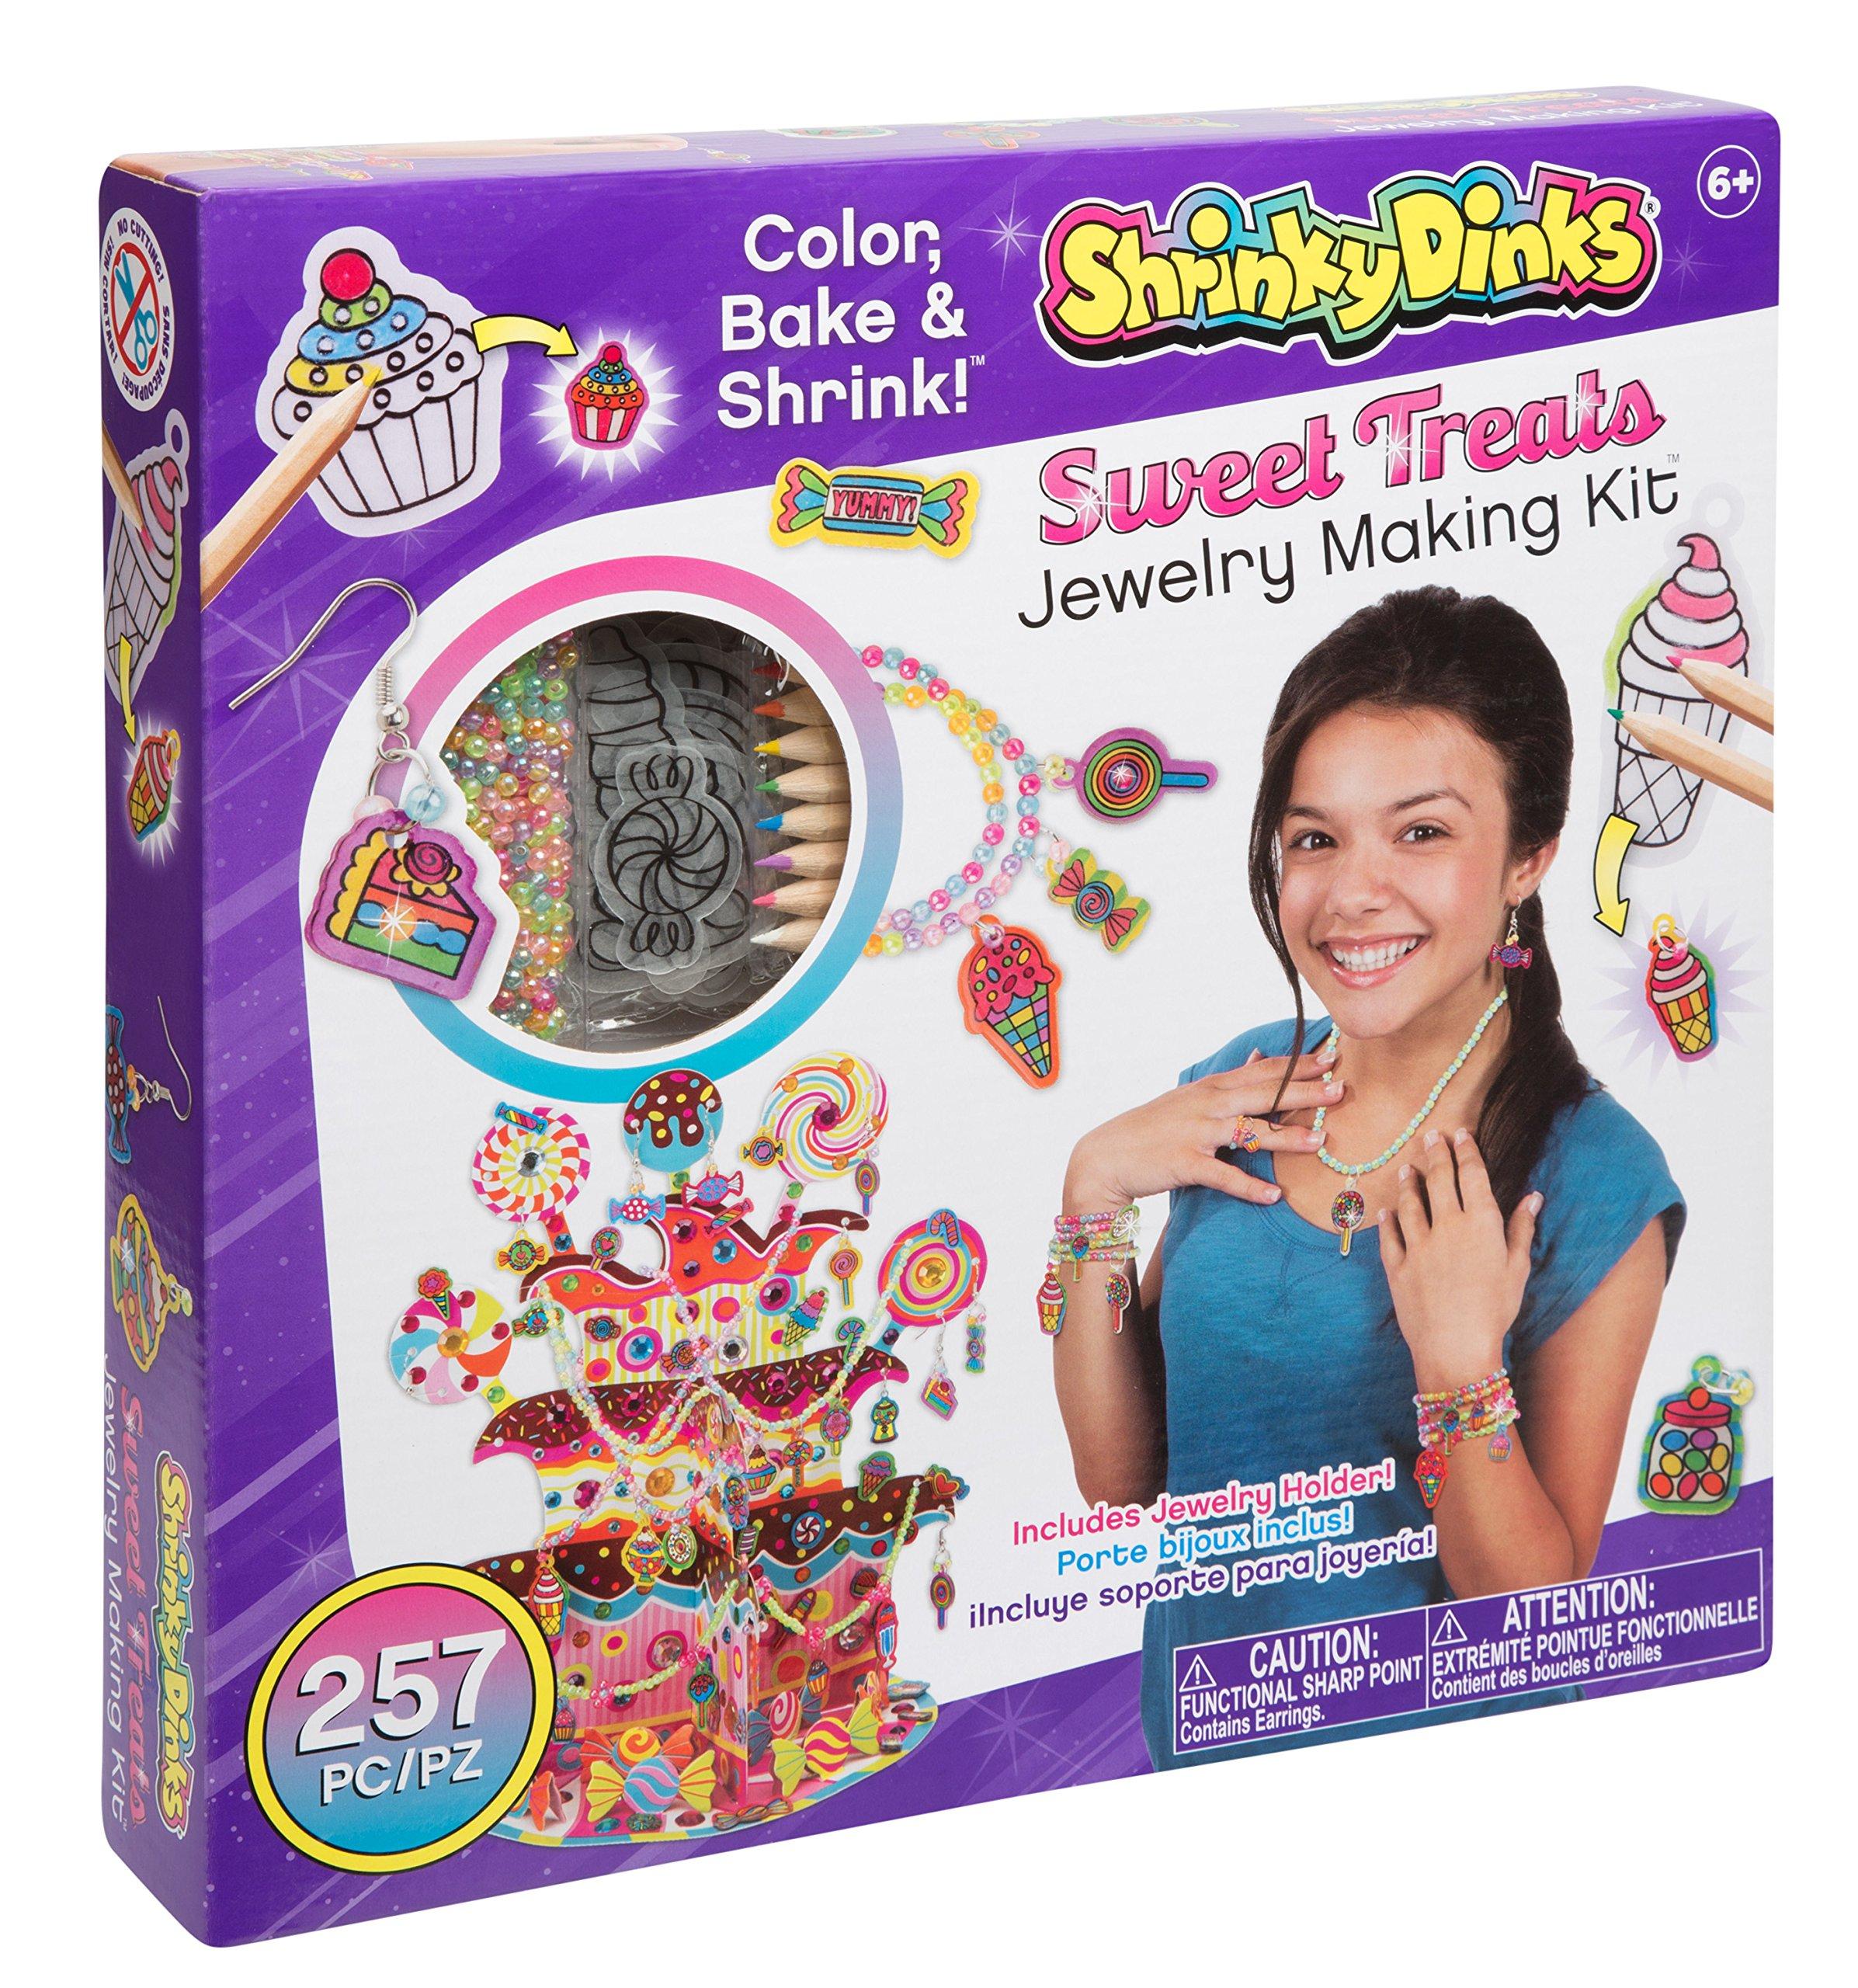 Shrinky Dinks So Sweet Treats Jewelry Kit